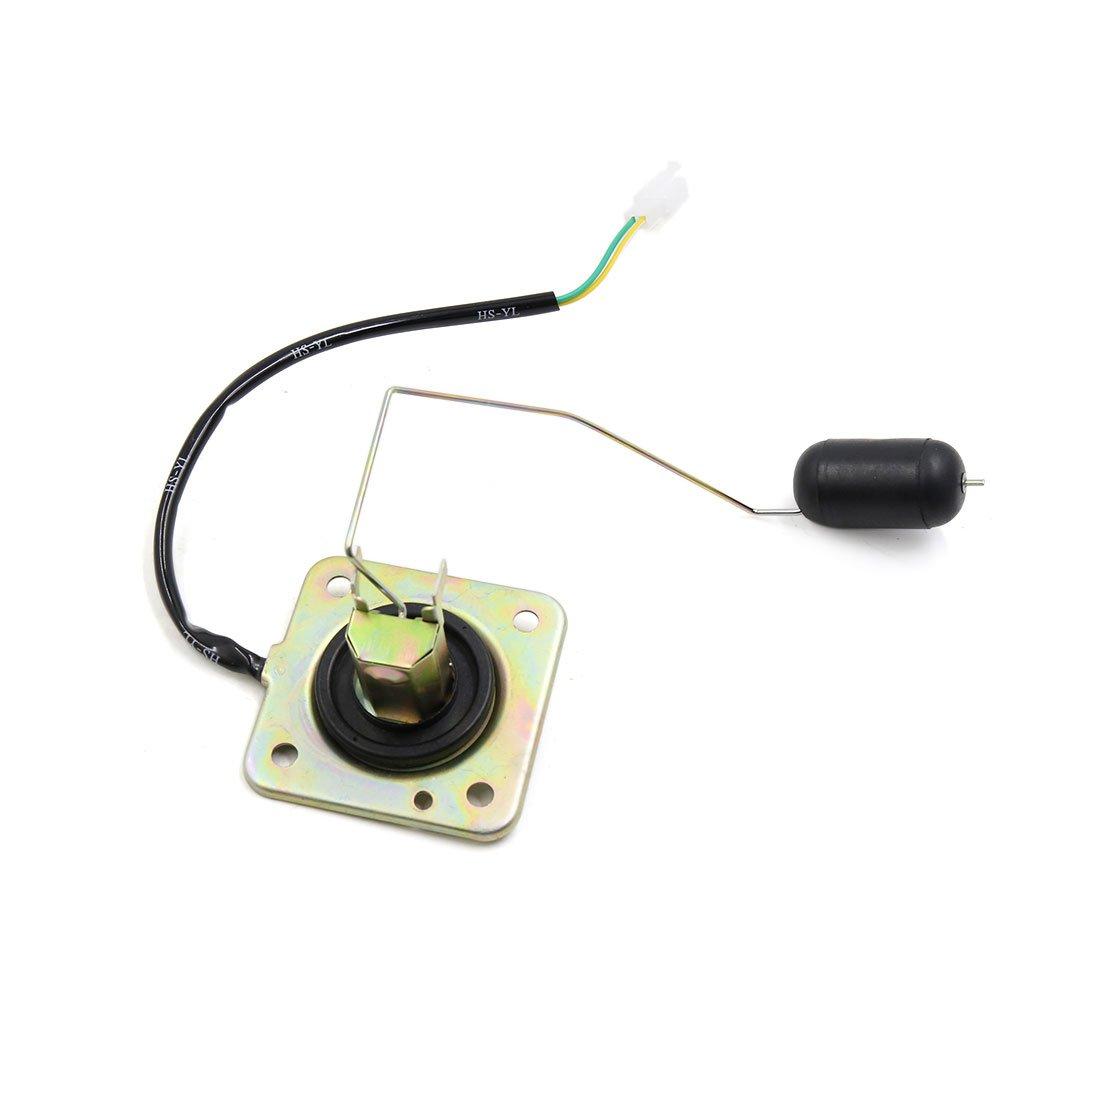 Sourcingmap Motorcycle Scooter Fuel Tank Level Float Sensor Sending Unit for Haojue ZB125 a18010200ux0167